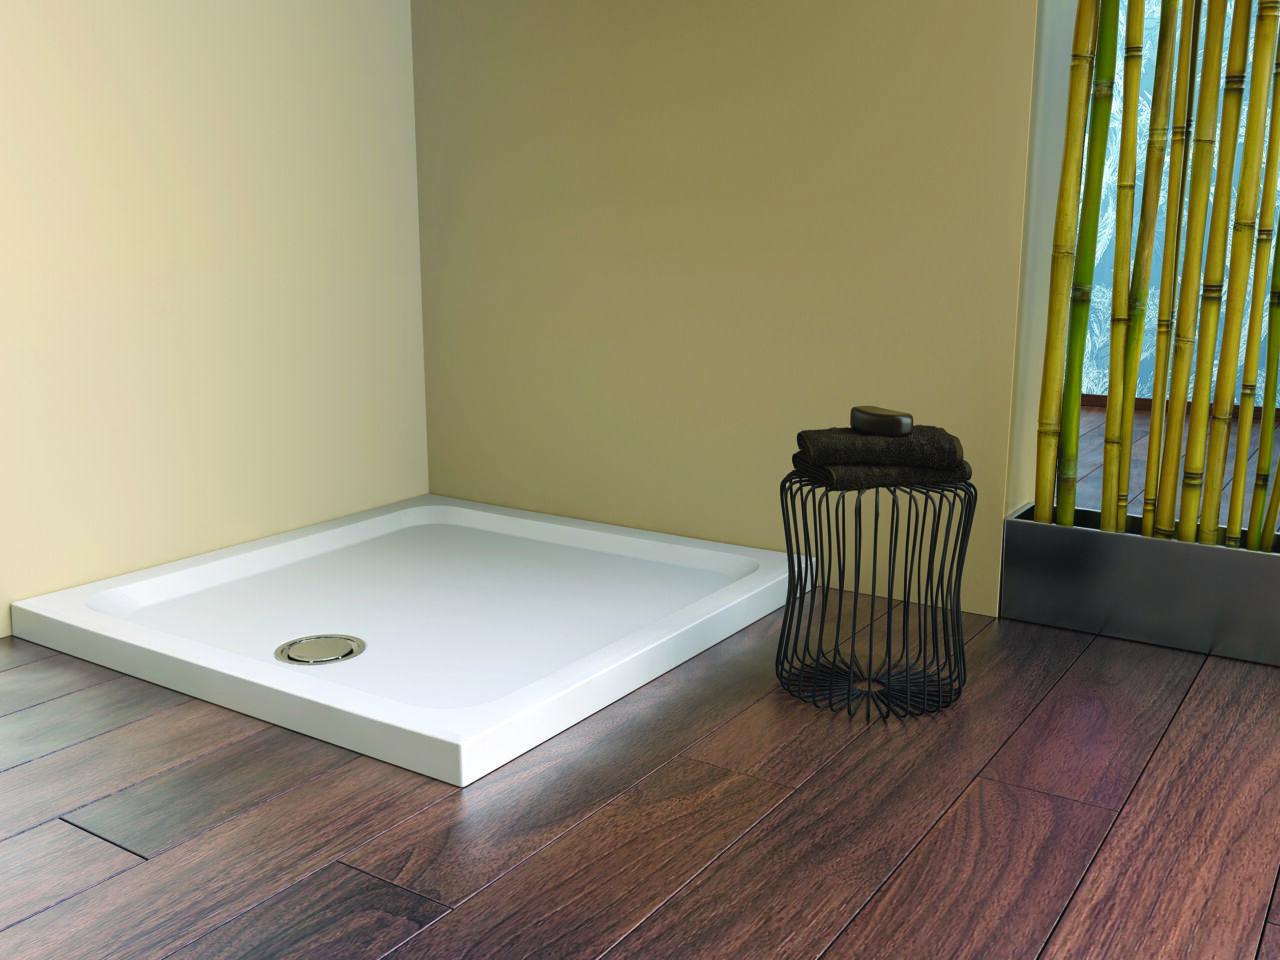 Fineline 60 Shower Tray - Matki